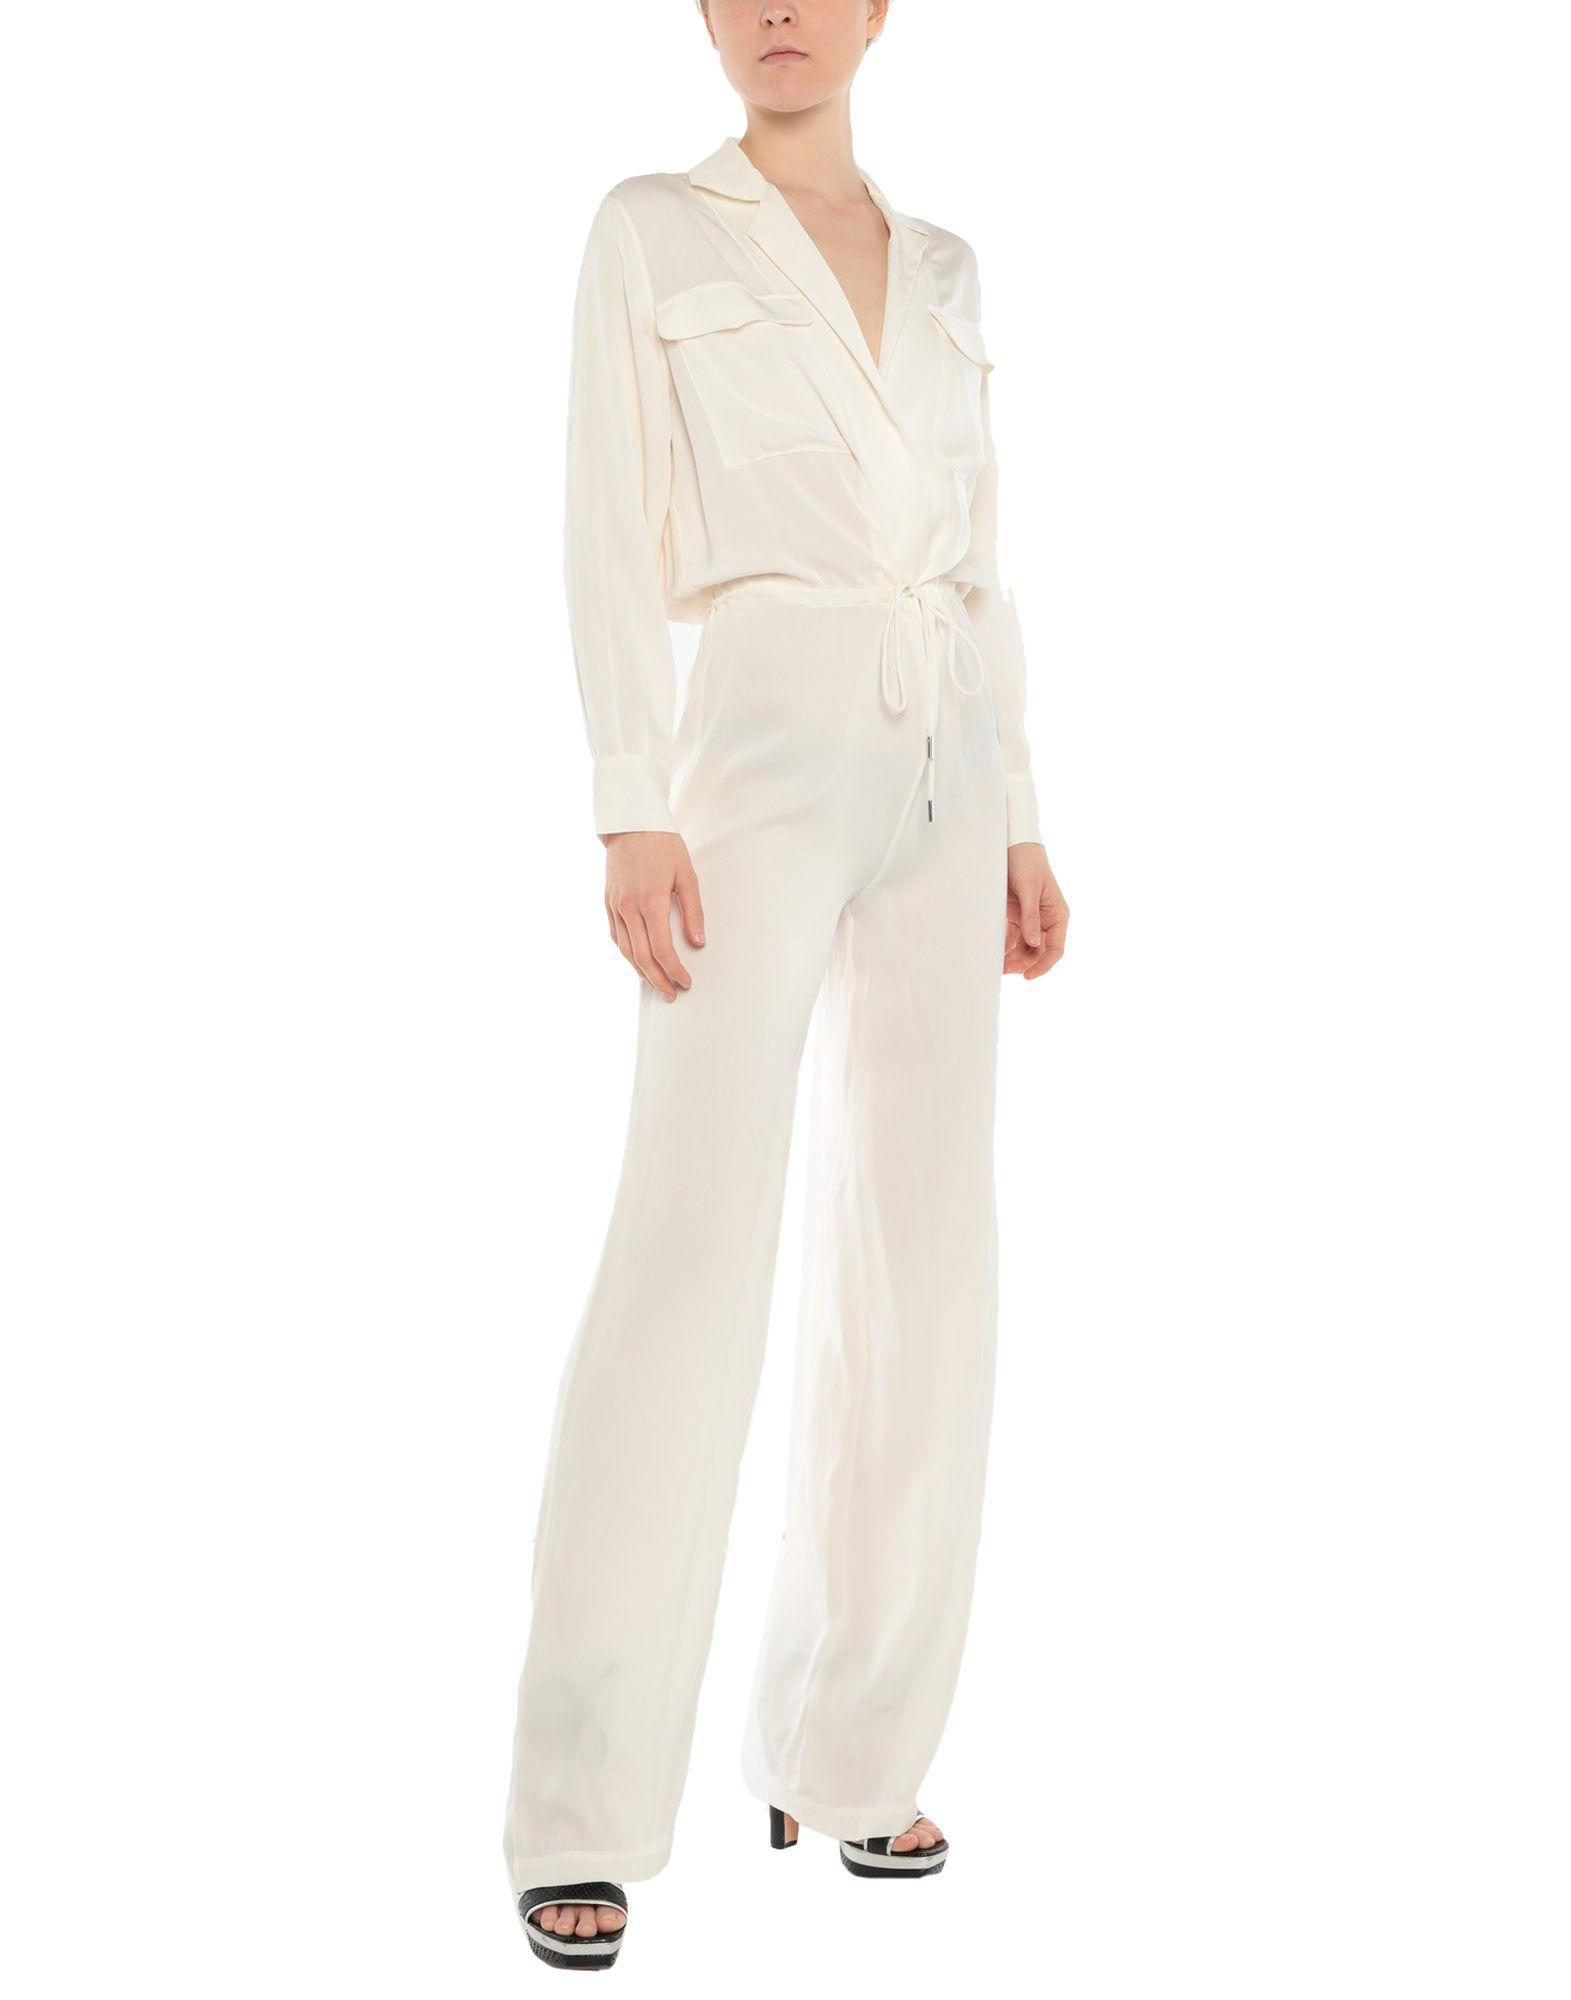 6378c49ecf5 Lyst - Ermanno Scervino Jumpsuit in White